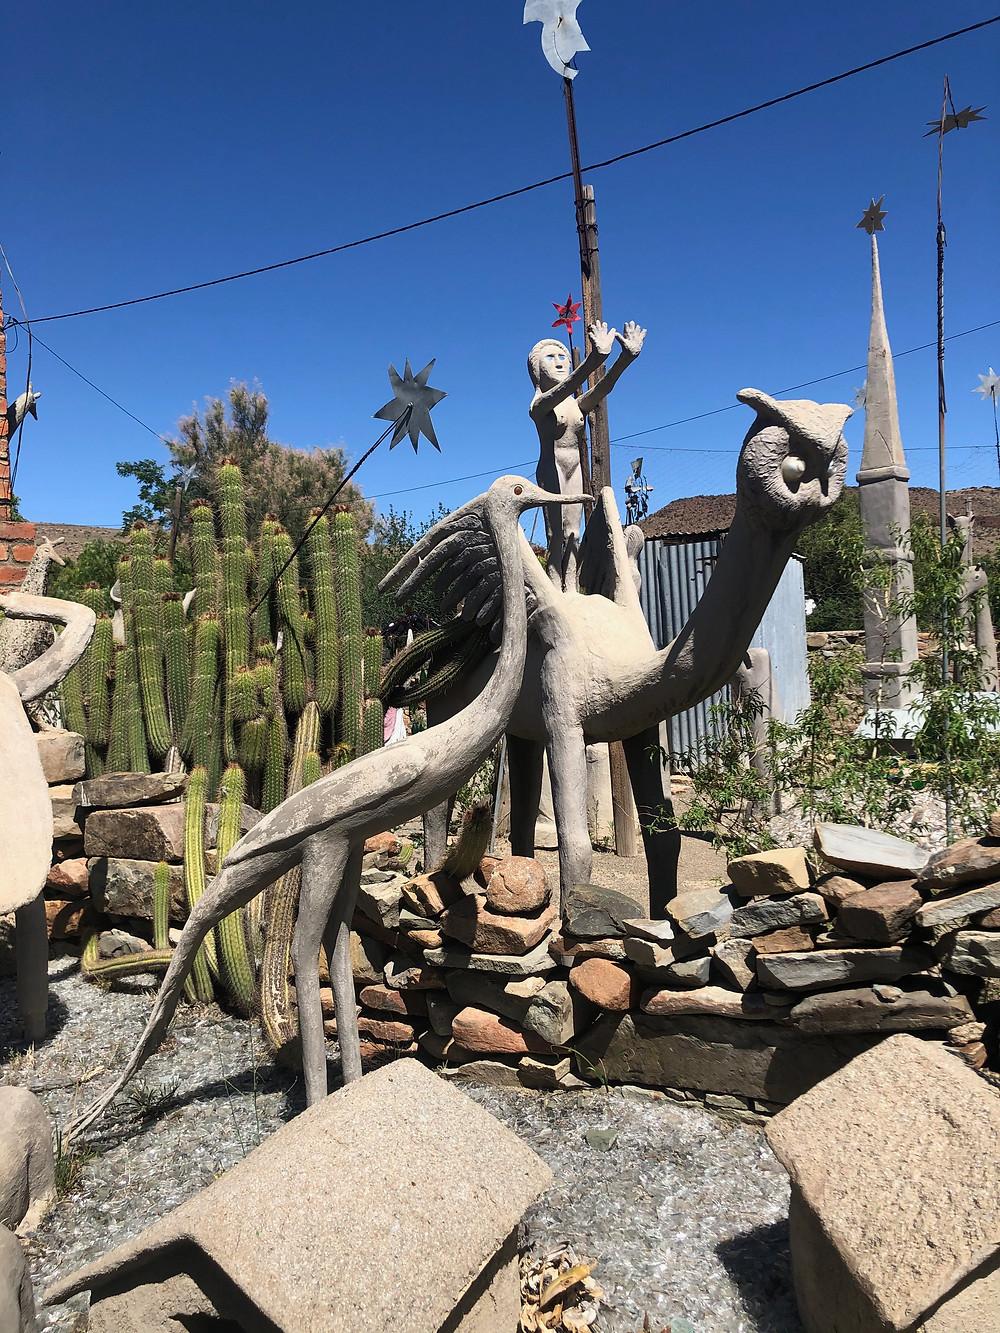 Sculptures Naïve art Art Brut Outsider art